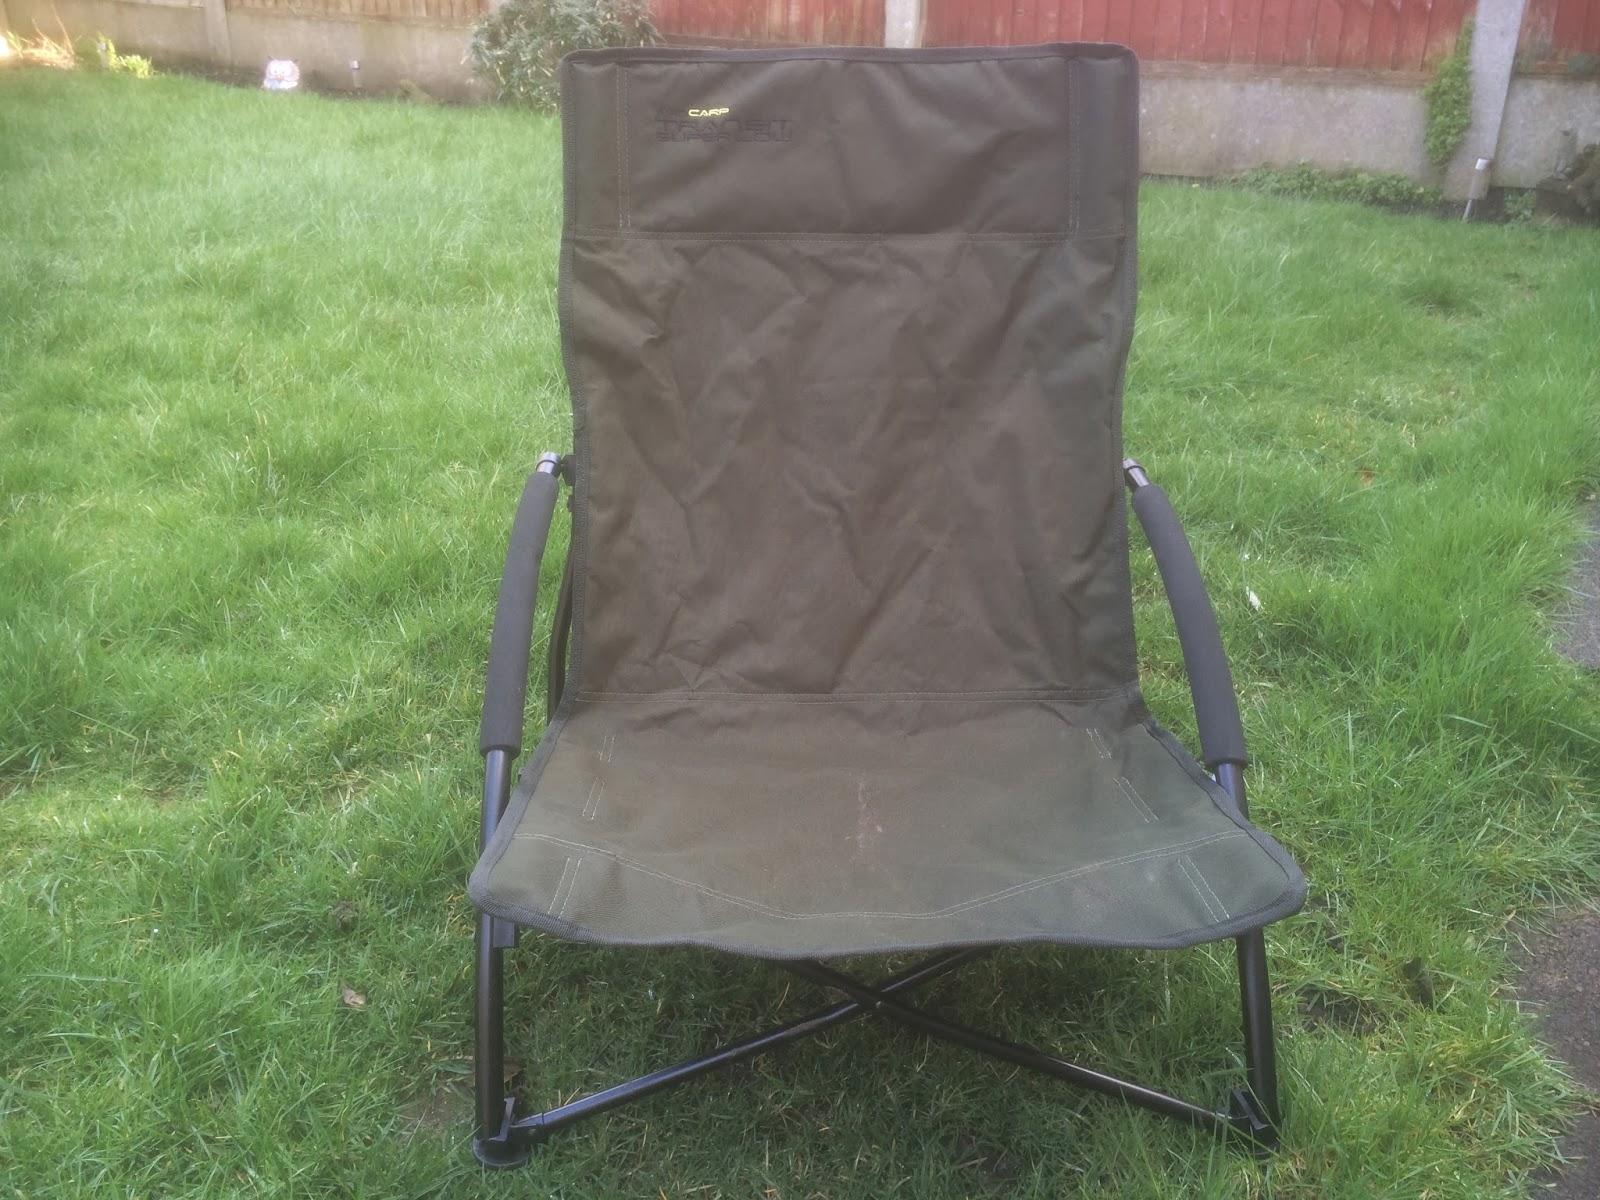 fishing chair no arms teak table chairs pete777 avid carp transit super low 3 14